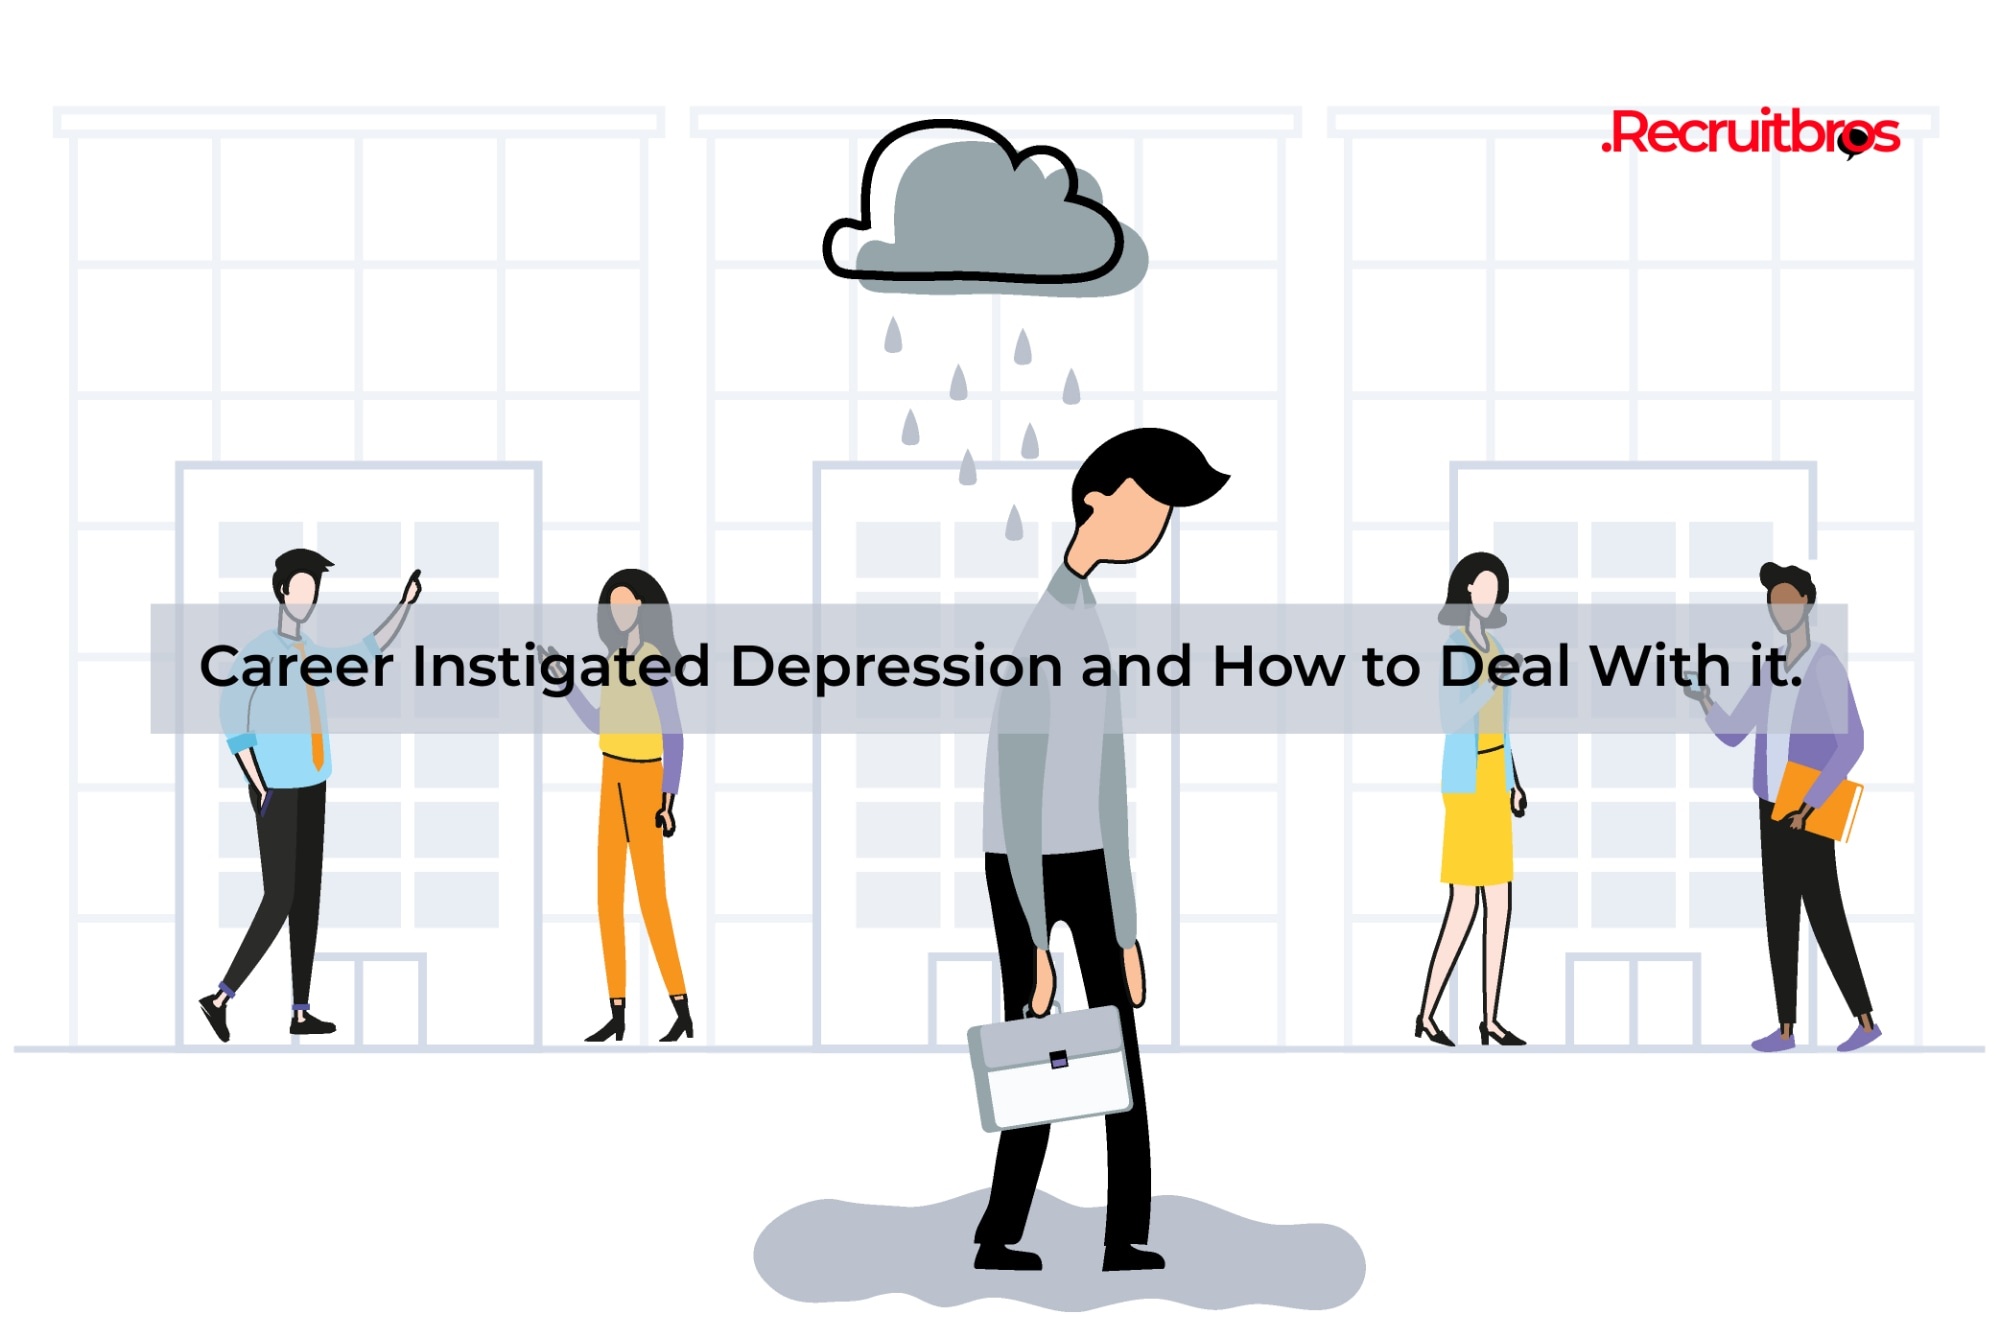 Career instigateddepression